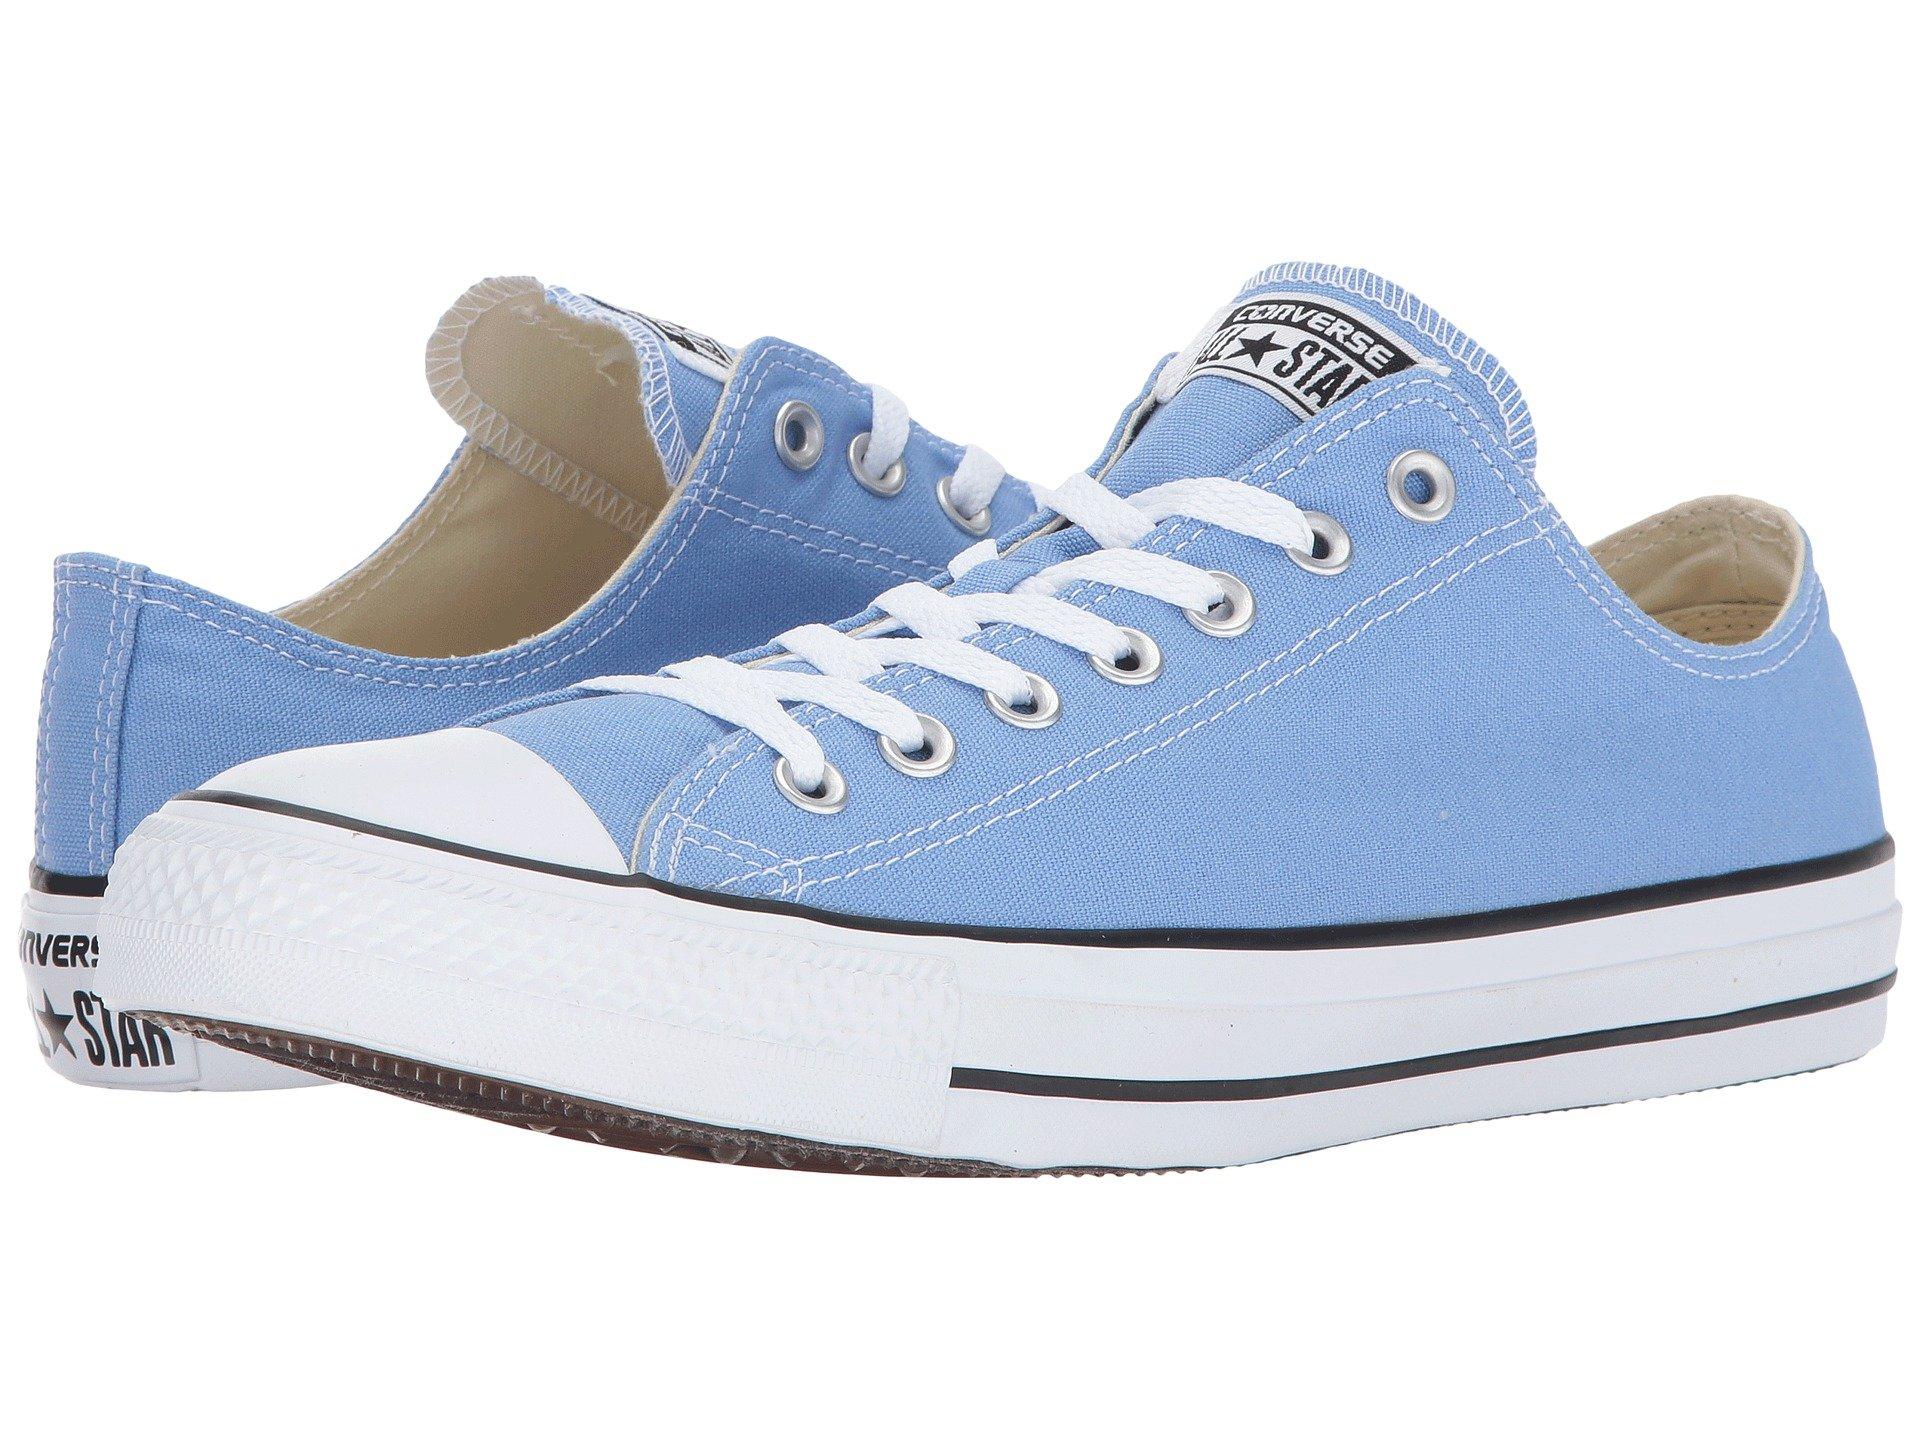 Converse Chuck Taylor All Star Seasonal Ox In Pioneer Blue ... 986329670